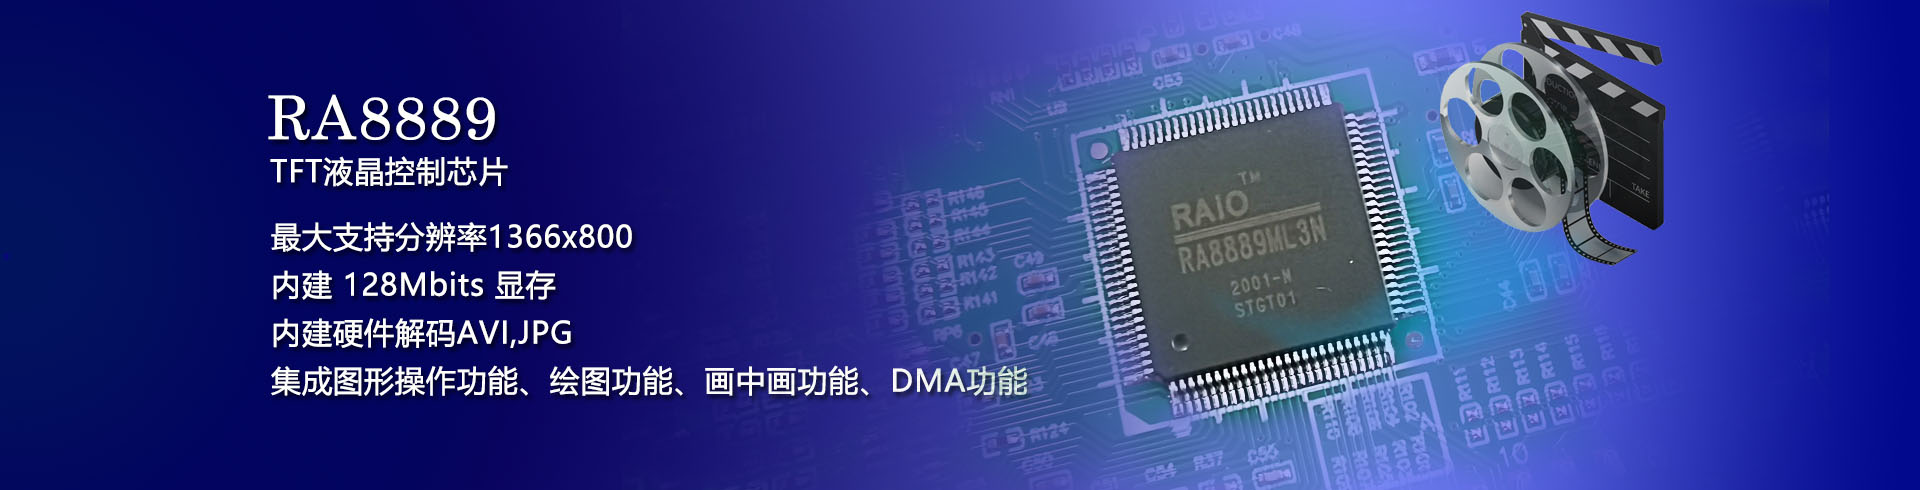 RA8889ML3N 单片机视频解码芯片 AVI JPG